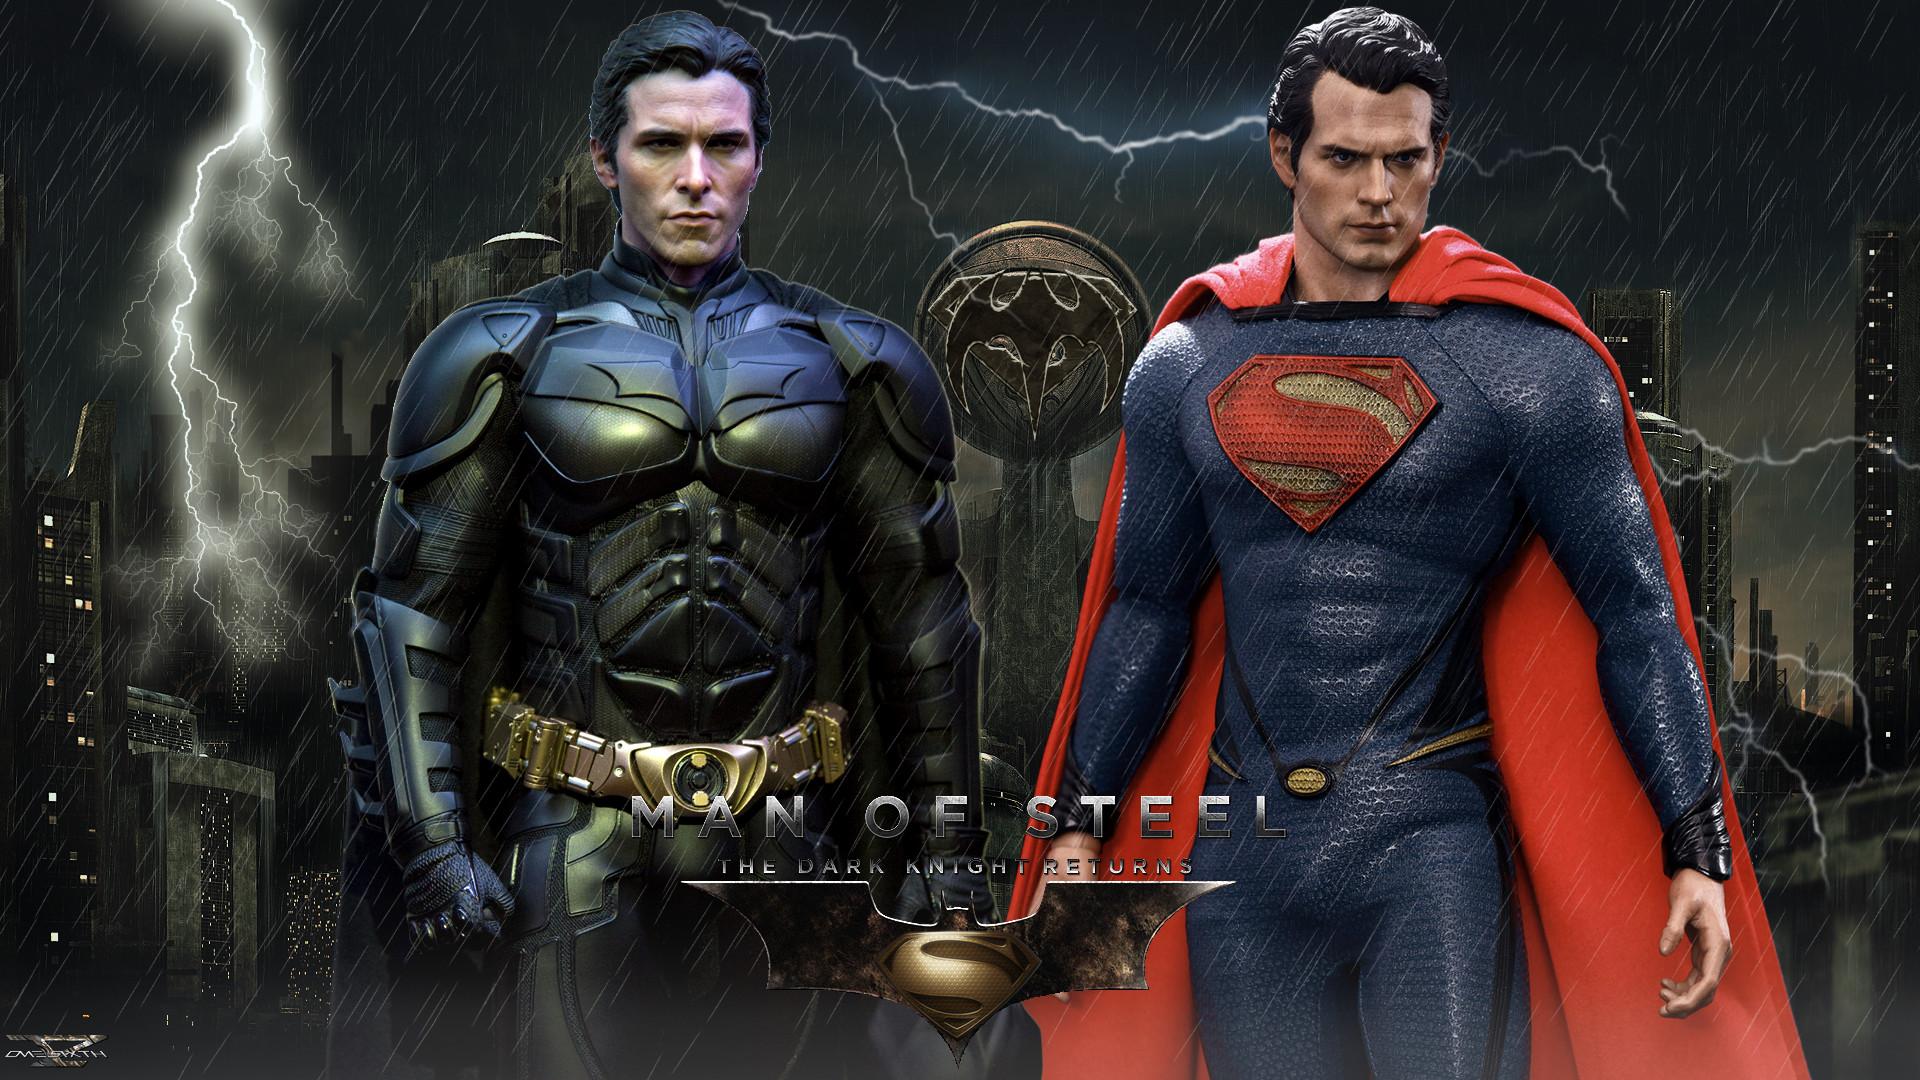 Man Of Steel – The Dark Knight Returns ( Hot Toys ) Full HD .